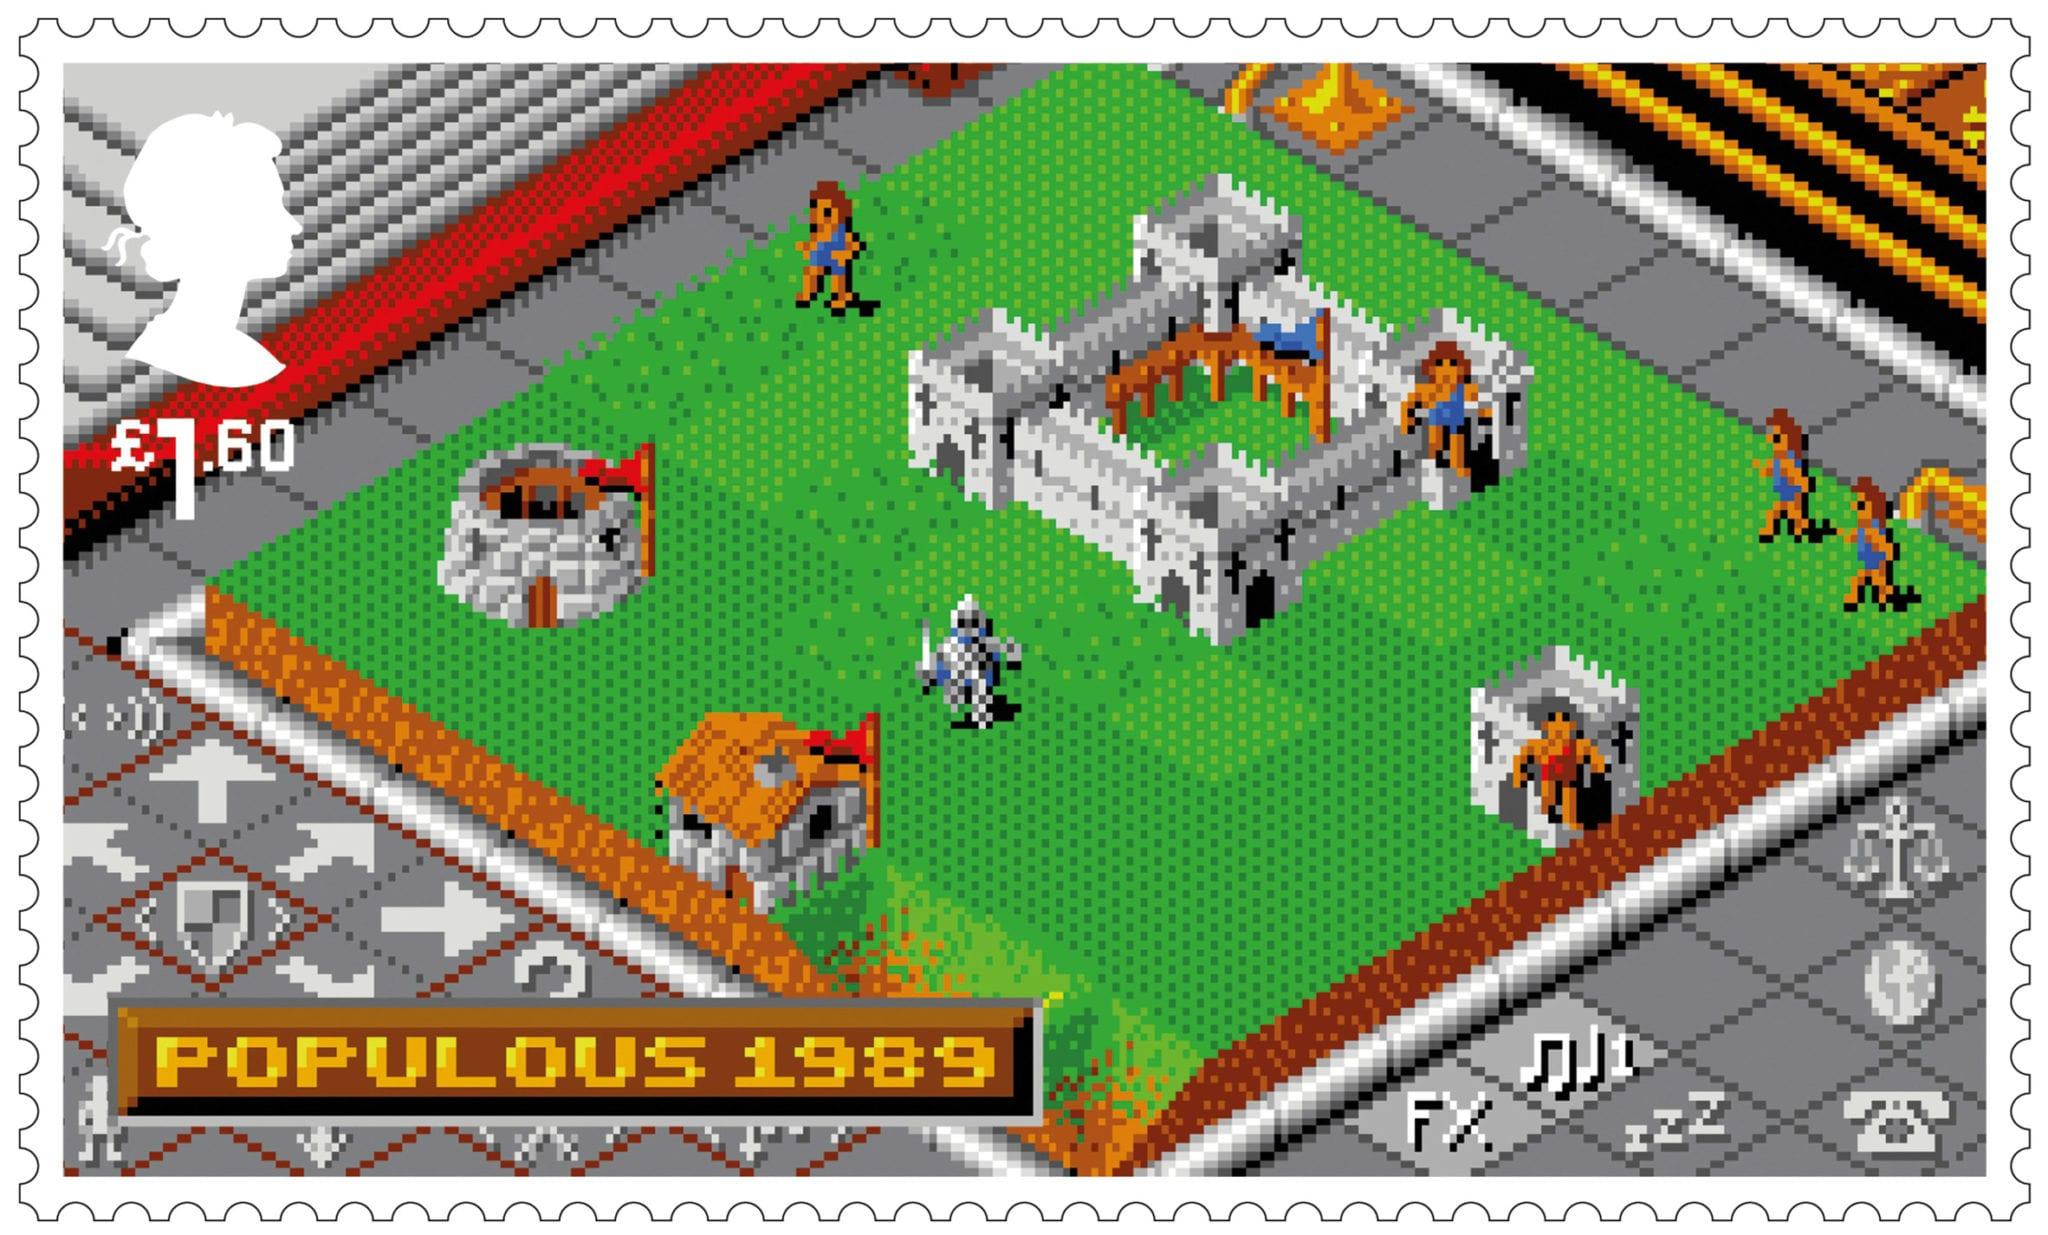 kráľovská pošta vzdáva hold ikonickým hrám 3 scaled - Kráľovská pošta vzdáva hold ikonickým hrám